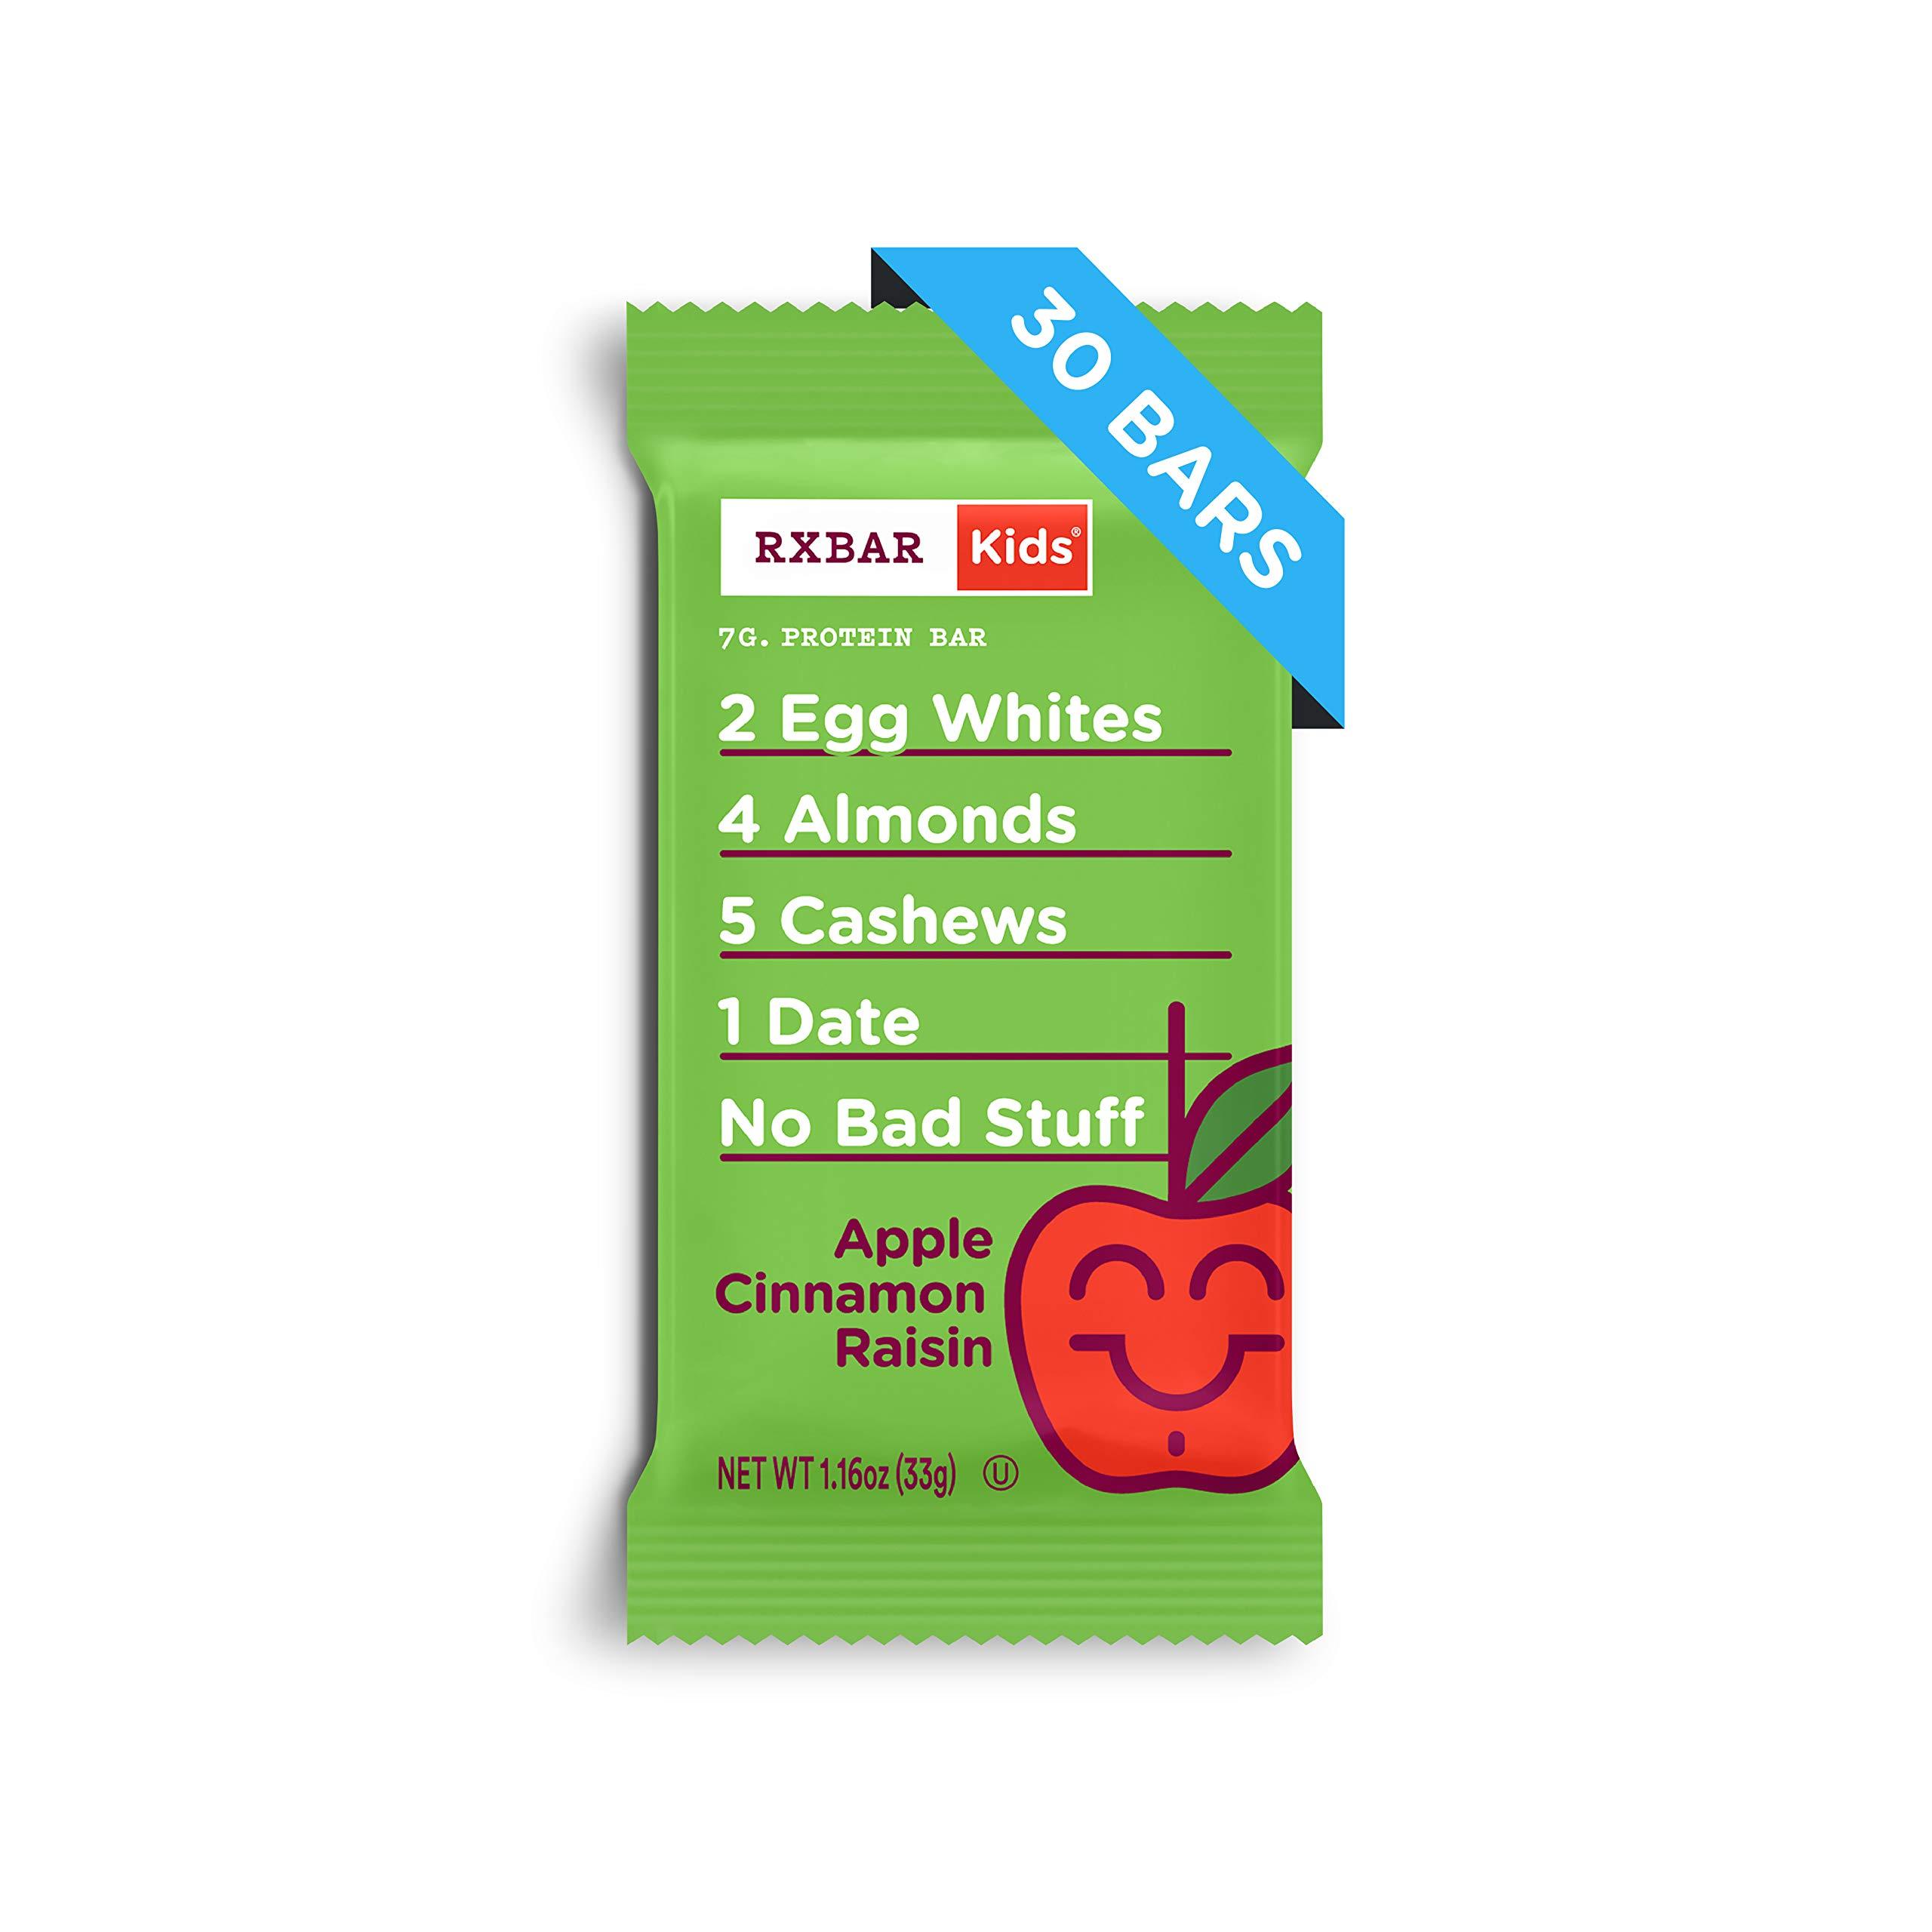 RXBAR Kids Real Food Protein Bar, Apple Cinnamon Raisin, Gluten Free, 1.16oz Bars, 30 Count